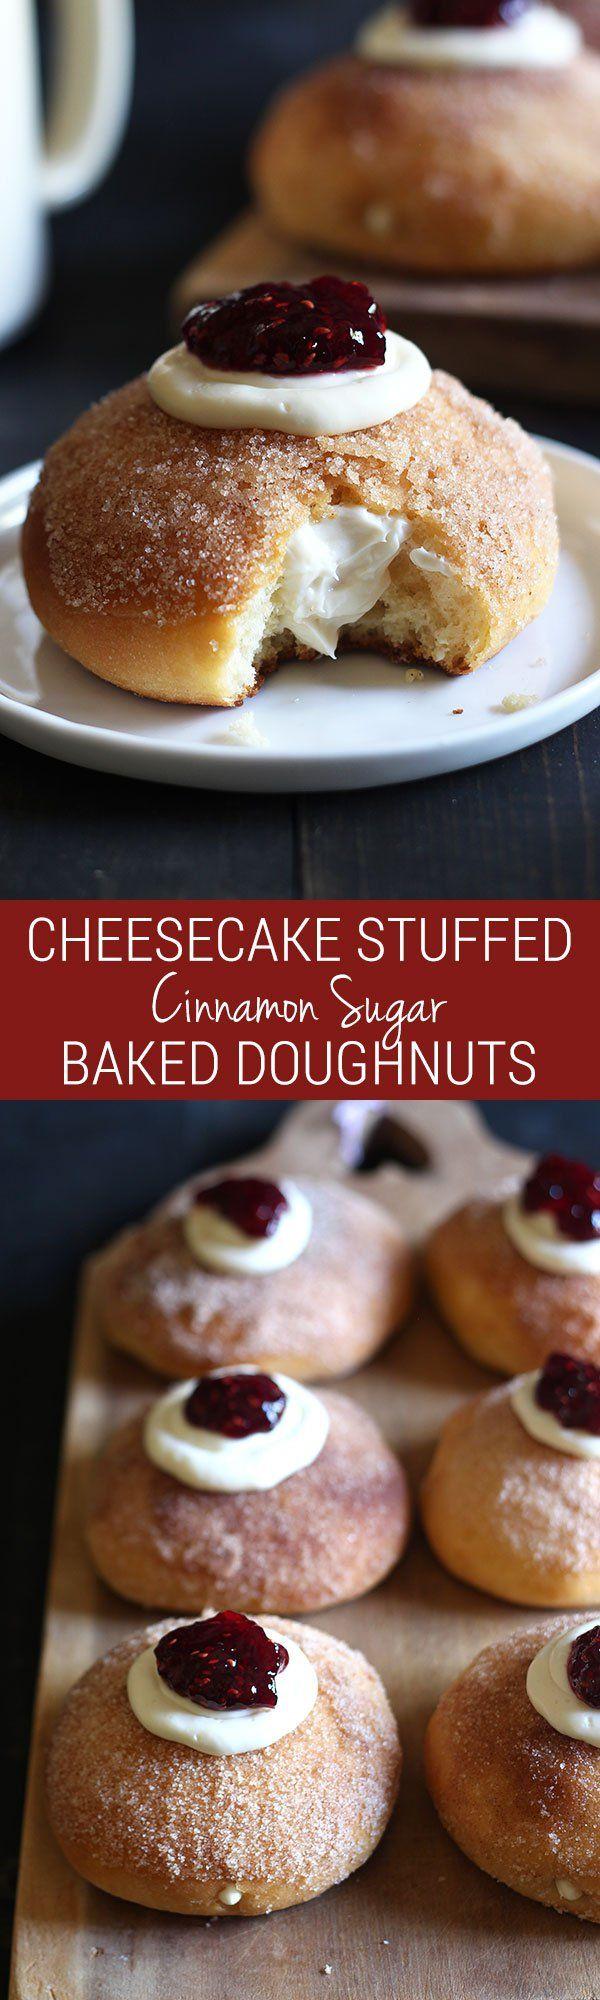 Cheesecake Stuffed Cinnamon Sugar Baked Doughnuts. #desserts